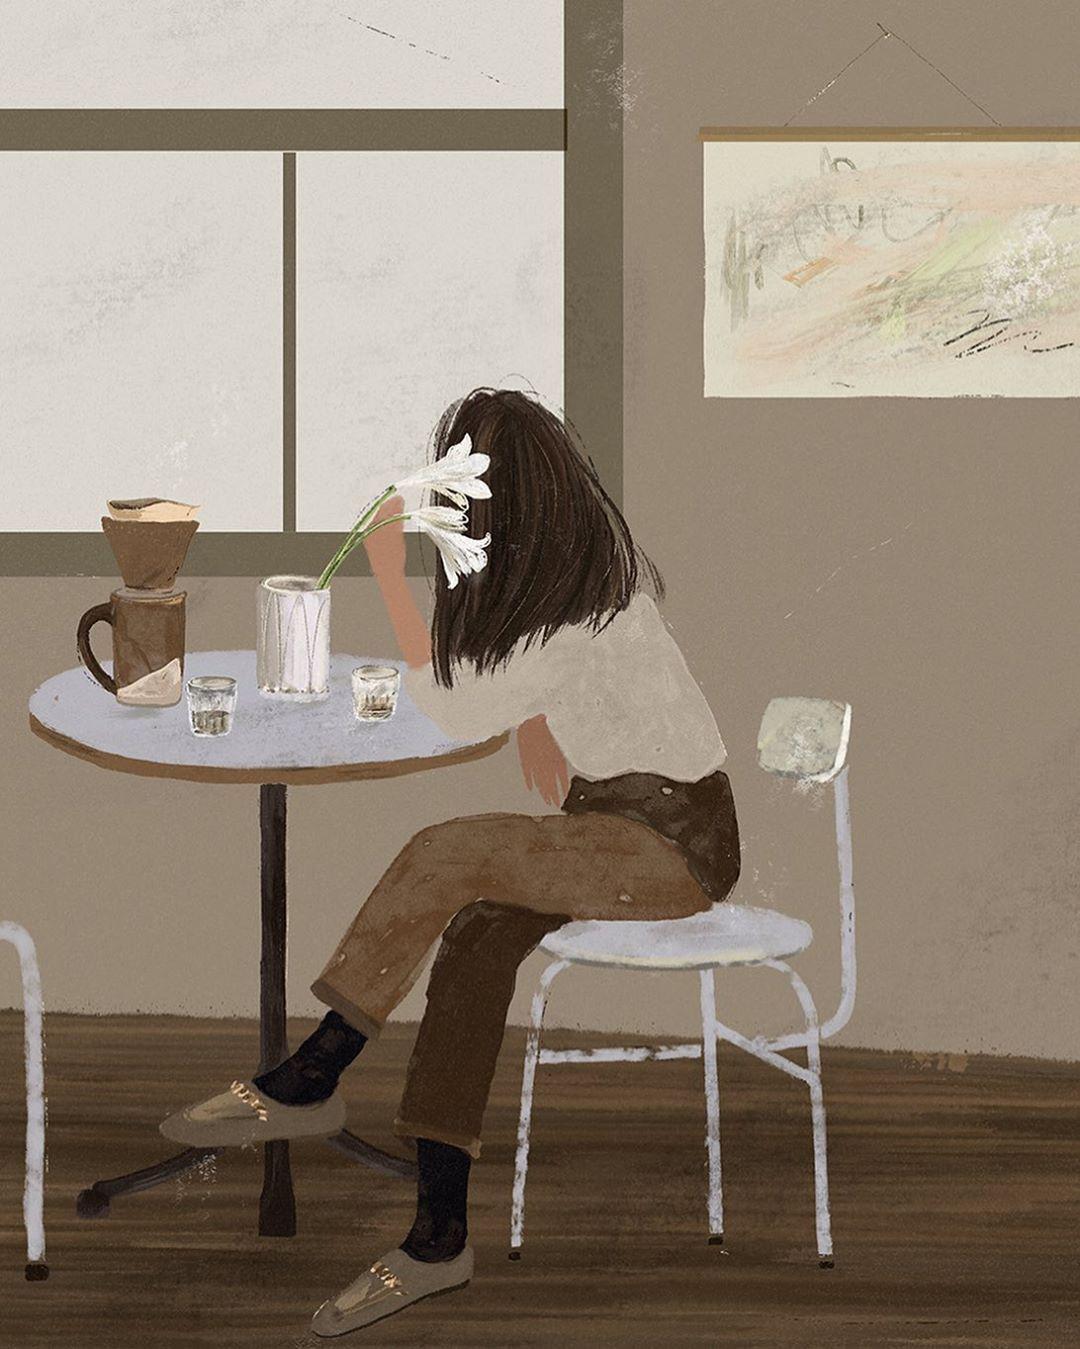 "Anastasi Holubchyk on Instagram: ""Current mood: Coffee dreamer👋🏼🐚 . . . . . . . . . . #moreartsdesign #creativityfound #makersmovement #art_we_inspire #showyourwork…"""